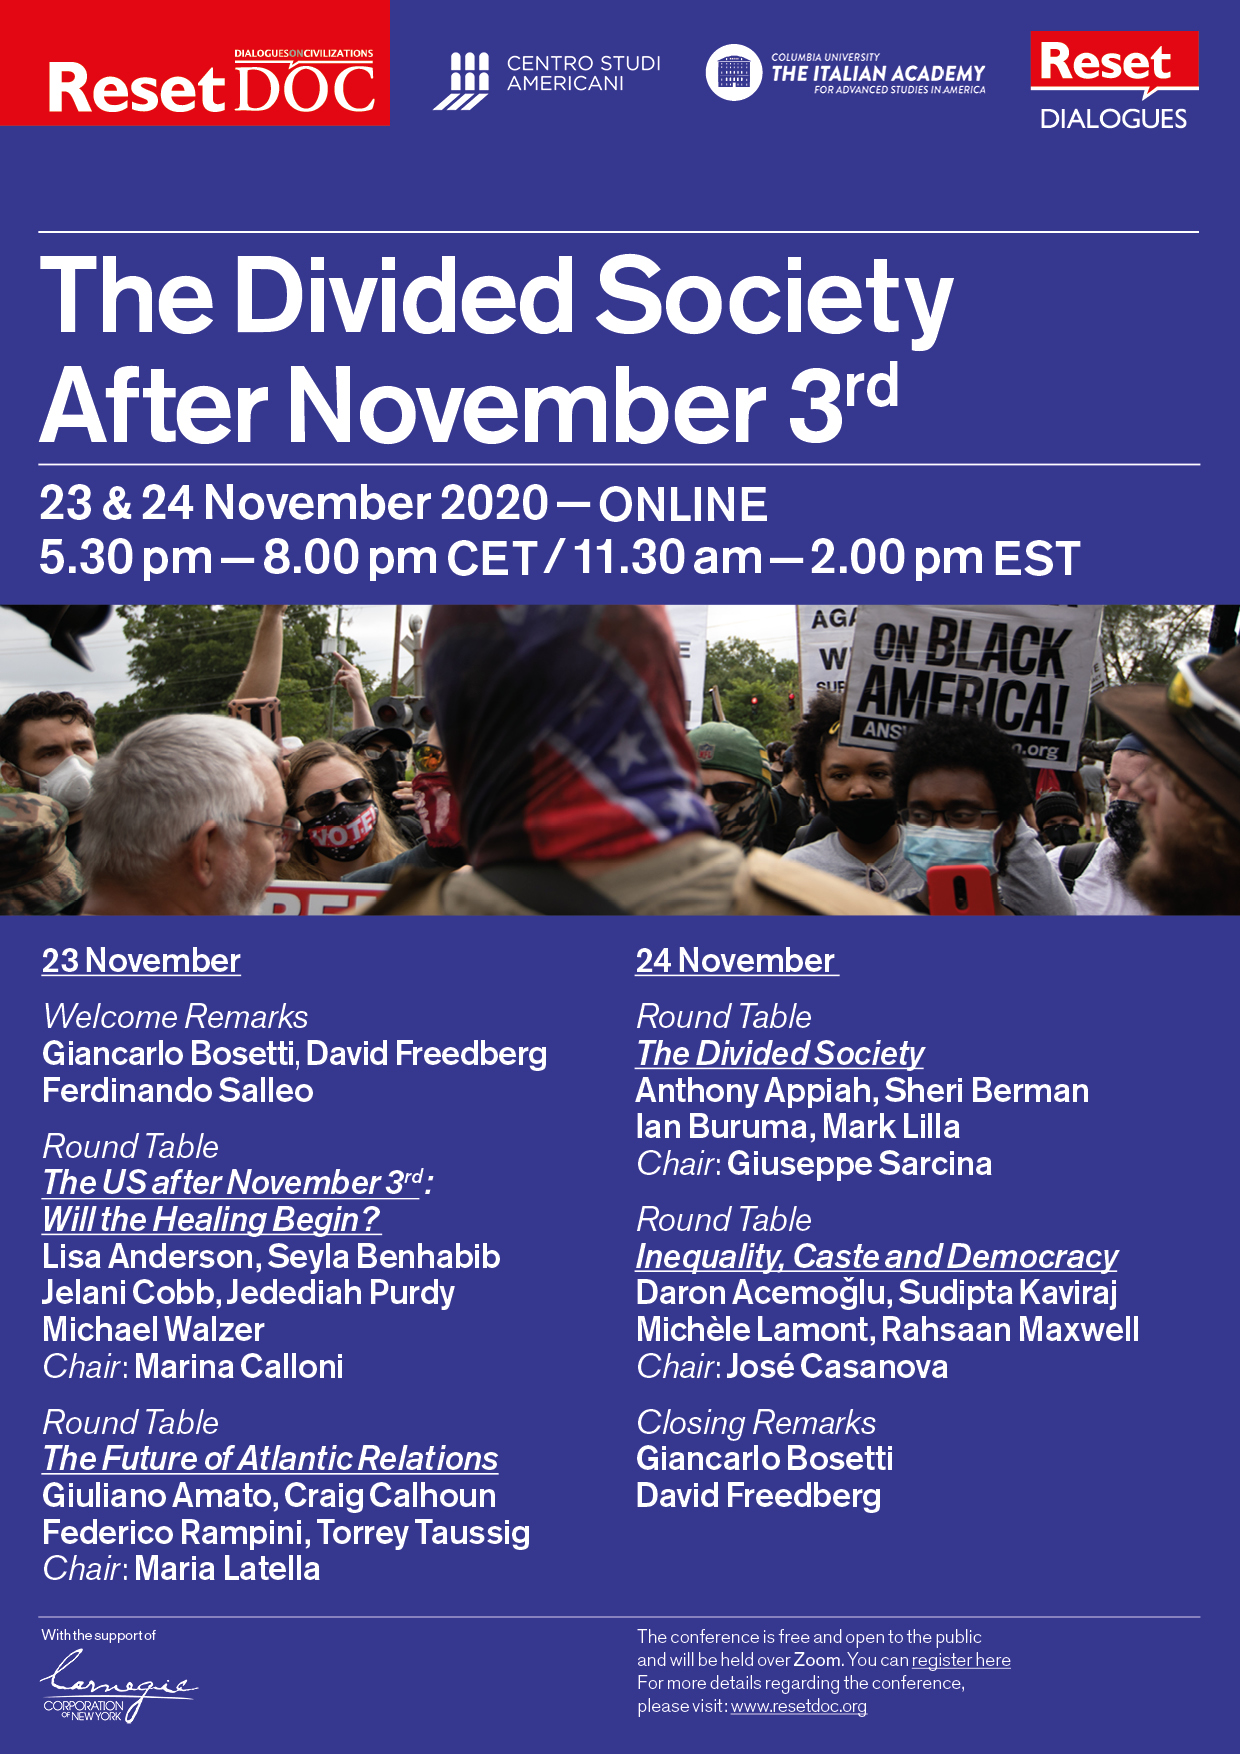 The Divided Society after 3 November